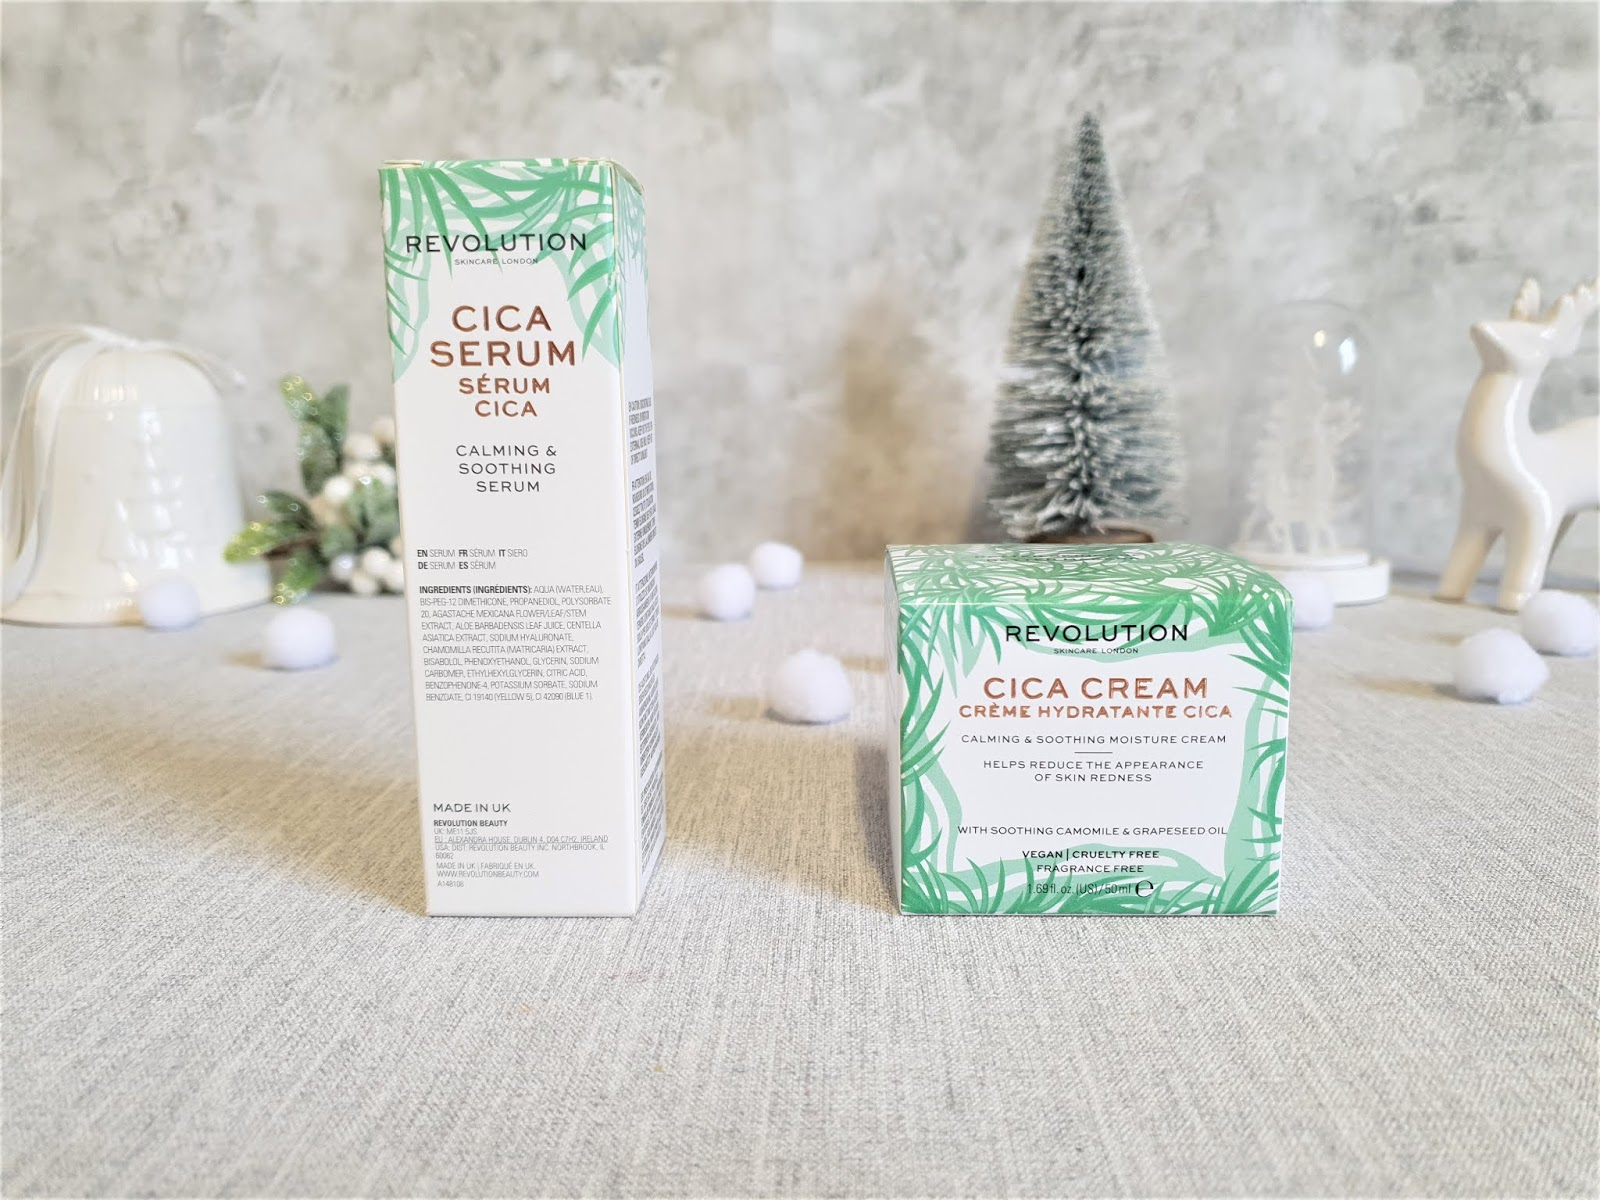 Kathryn S Loves Revolution Skincare Cica Serum Cream Review